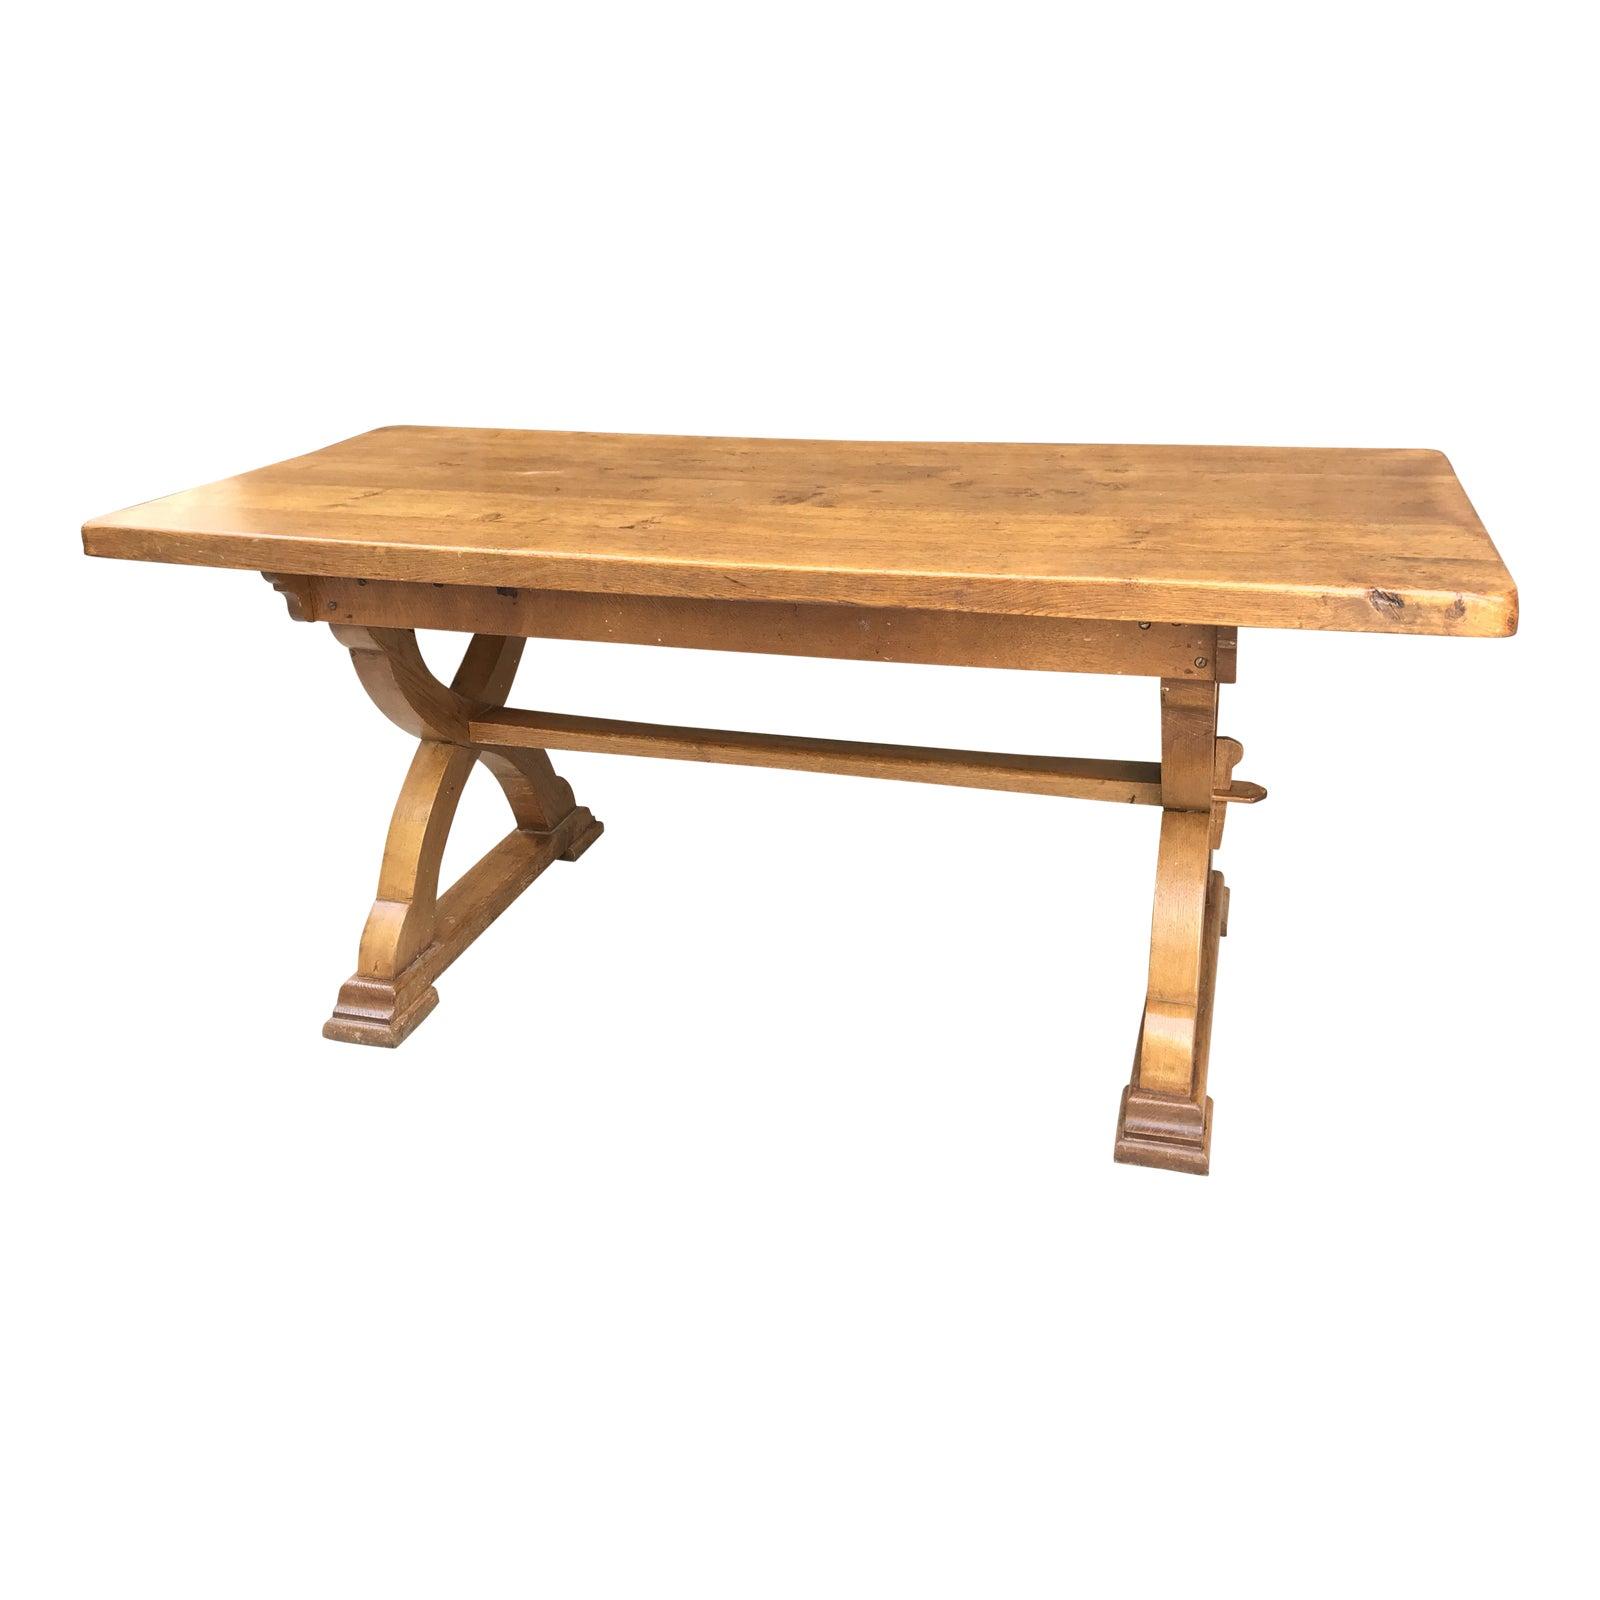 dining table_11_chairish.jpg